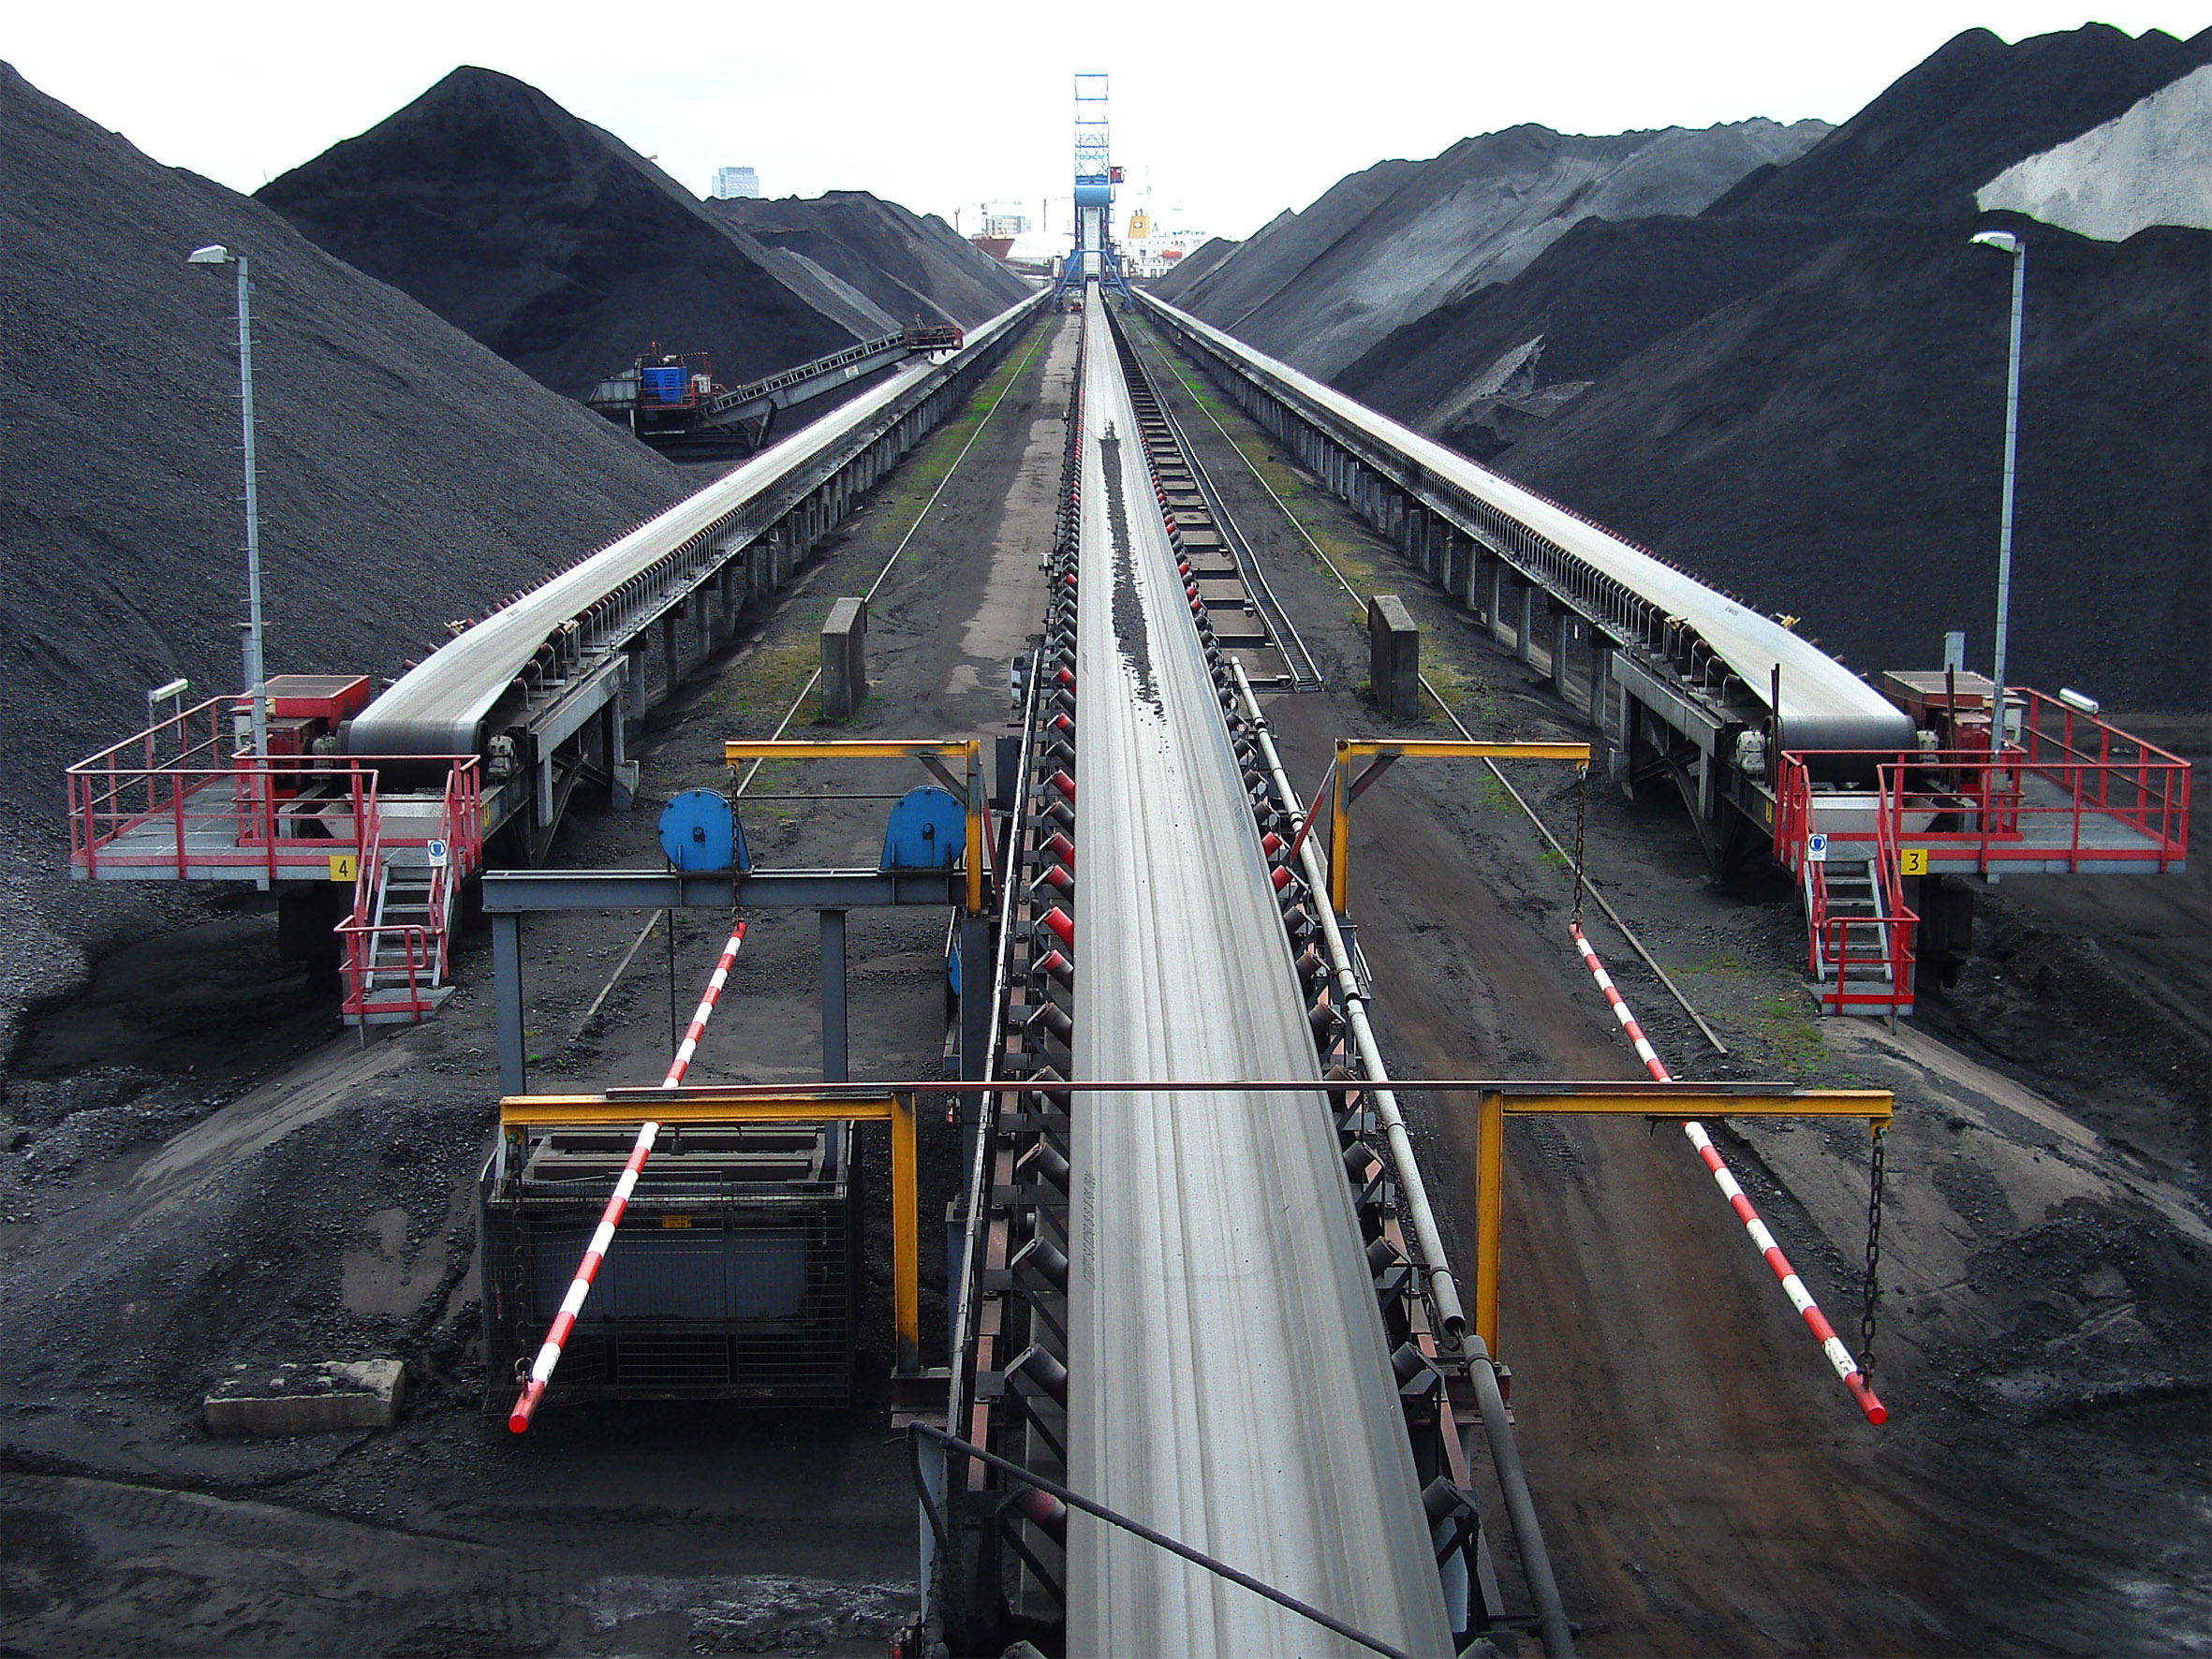 Coal transshipment conveyors